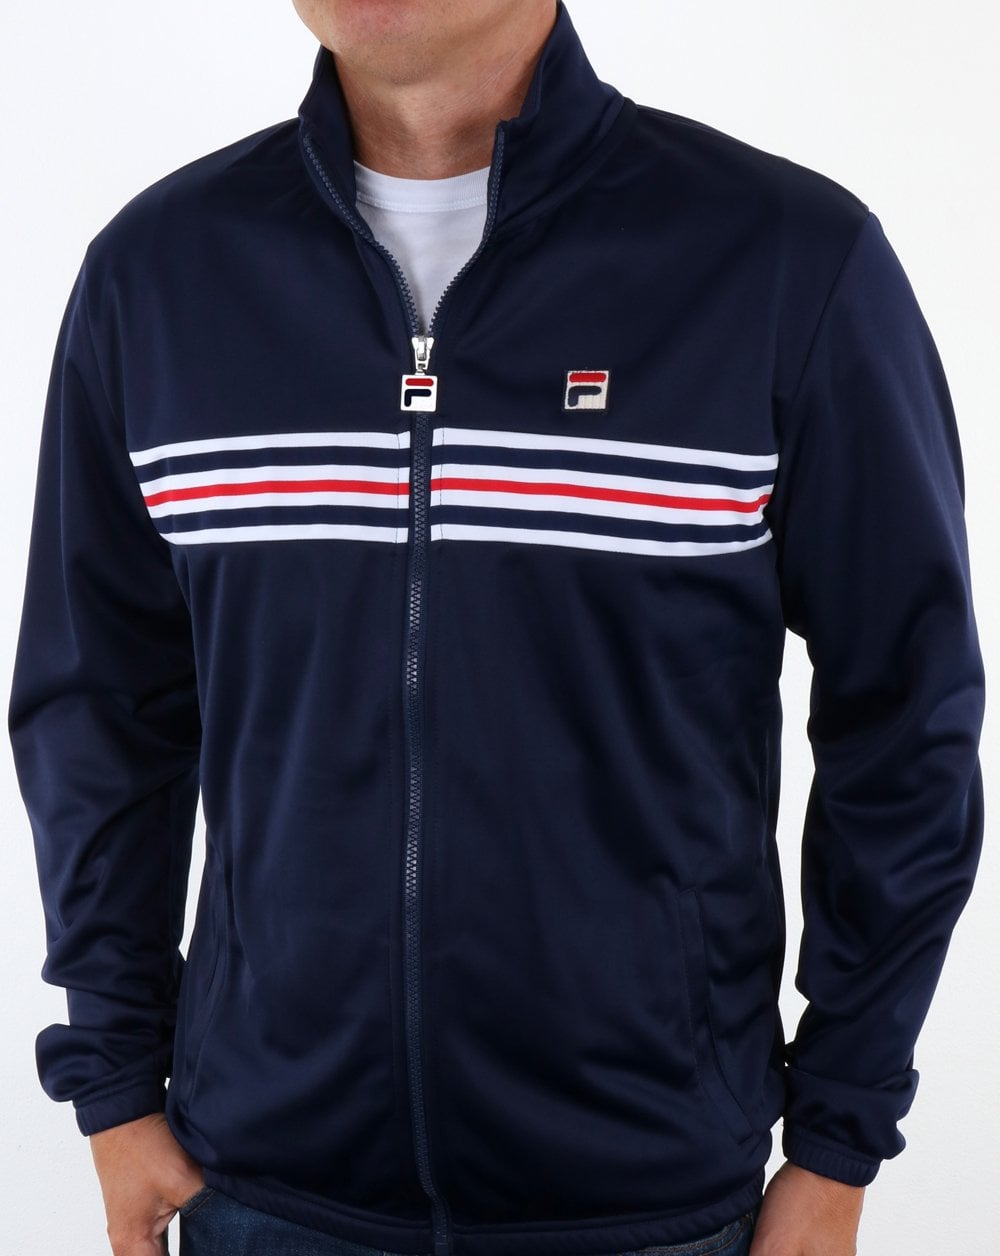 Fila chest striped jacket